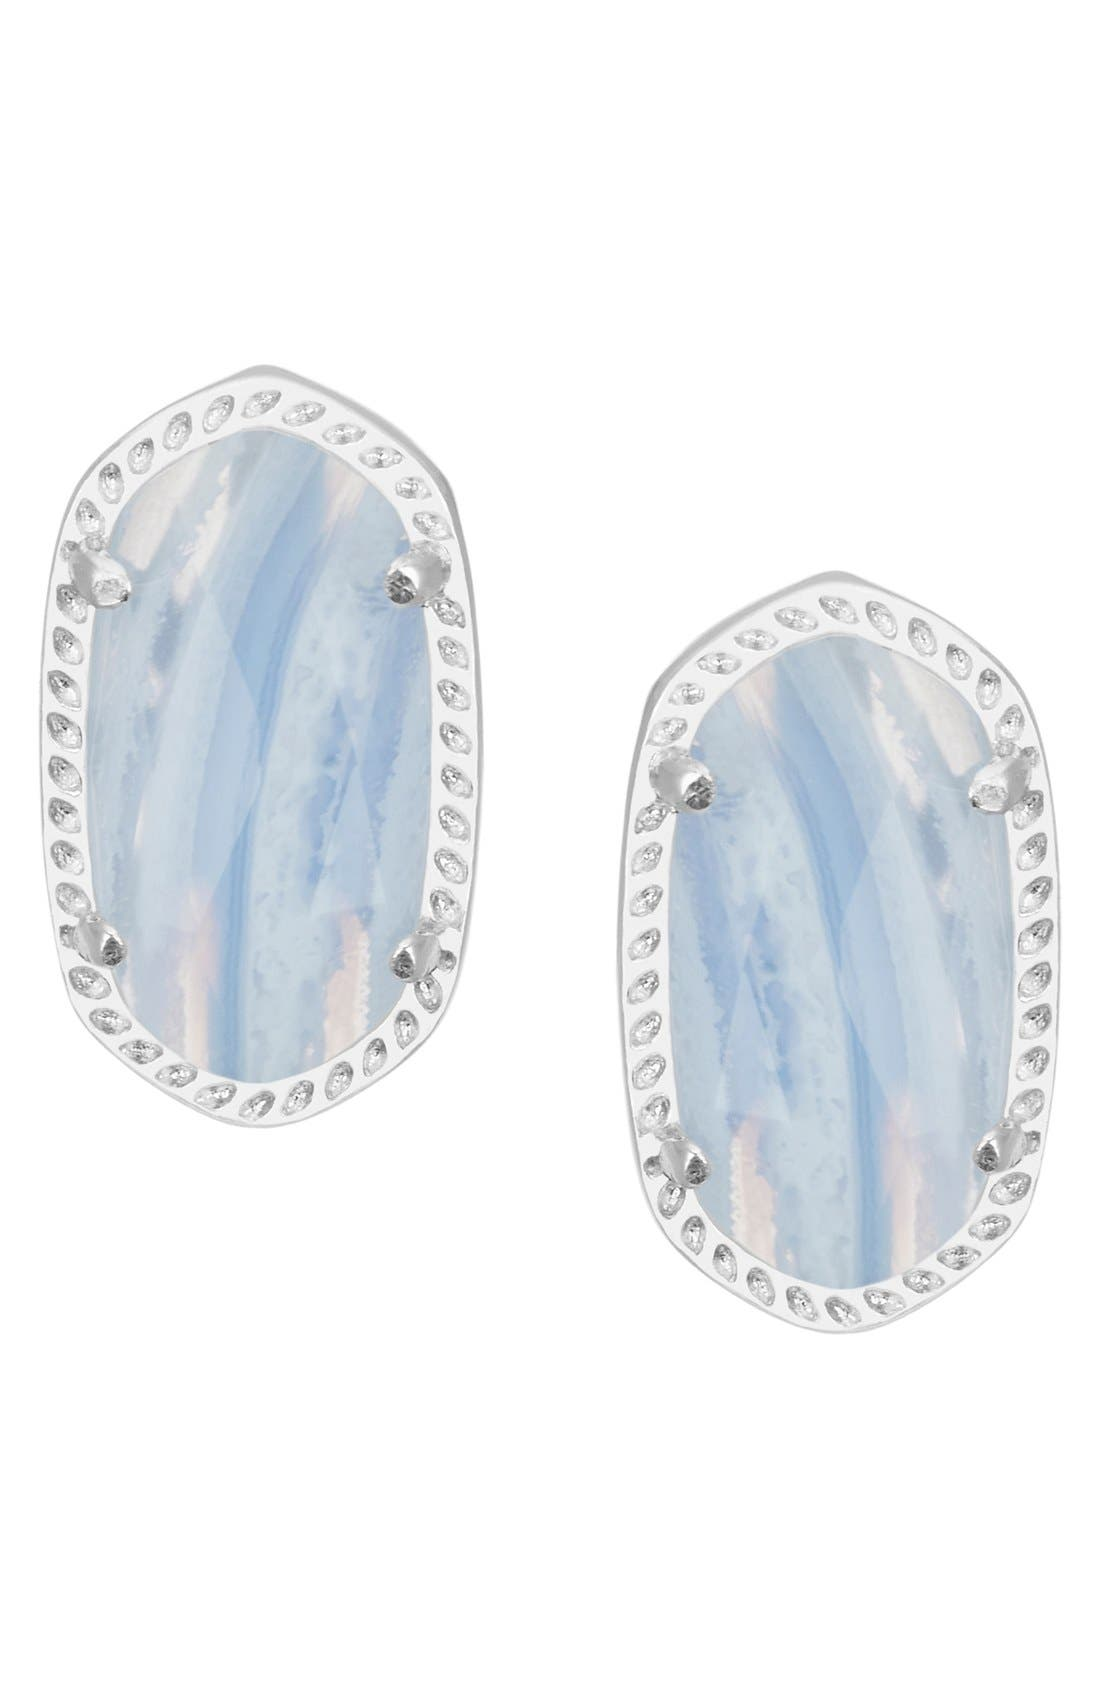 Alternate Image 1 Selected - Kendra Scott Ellie Oval Stud Earrings